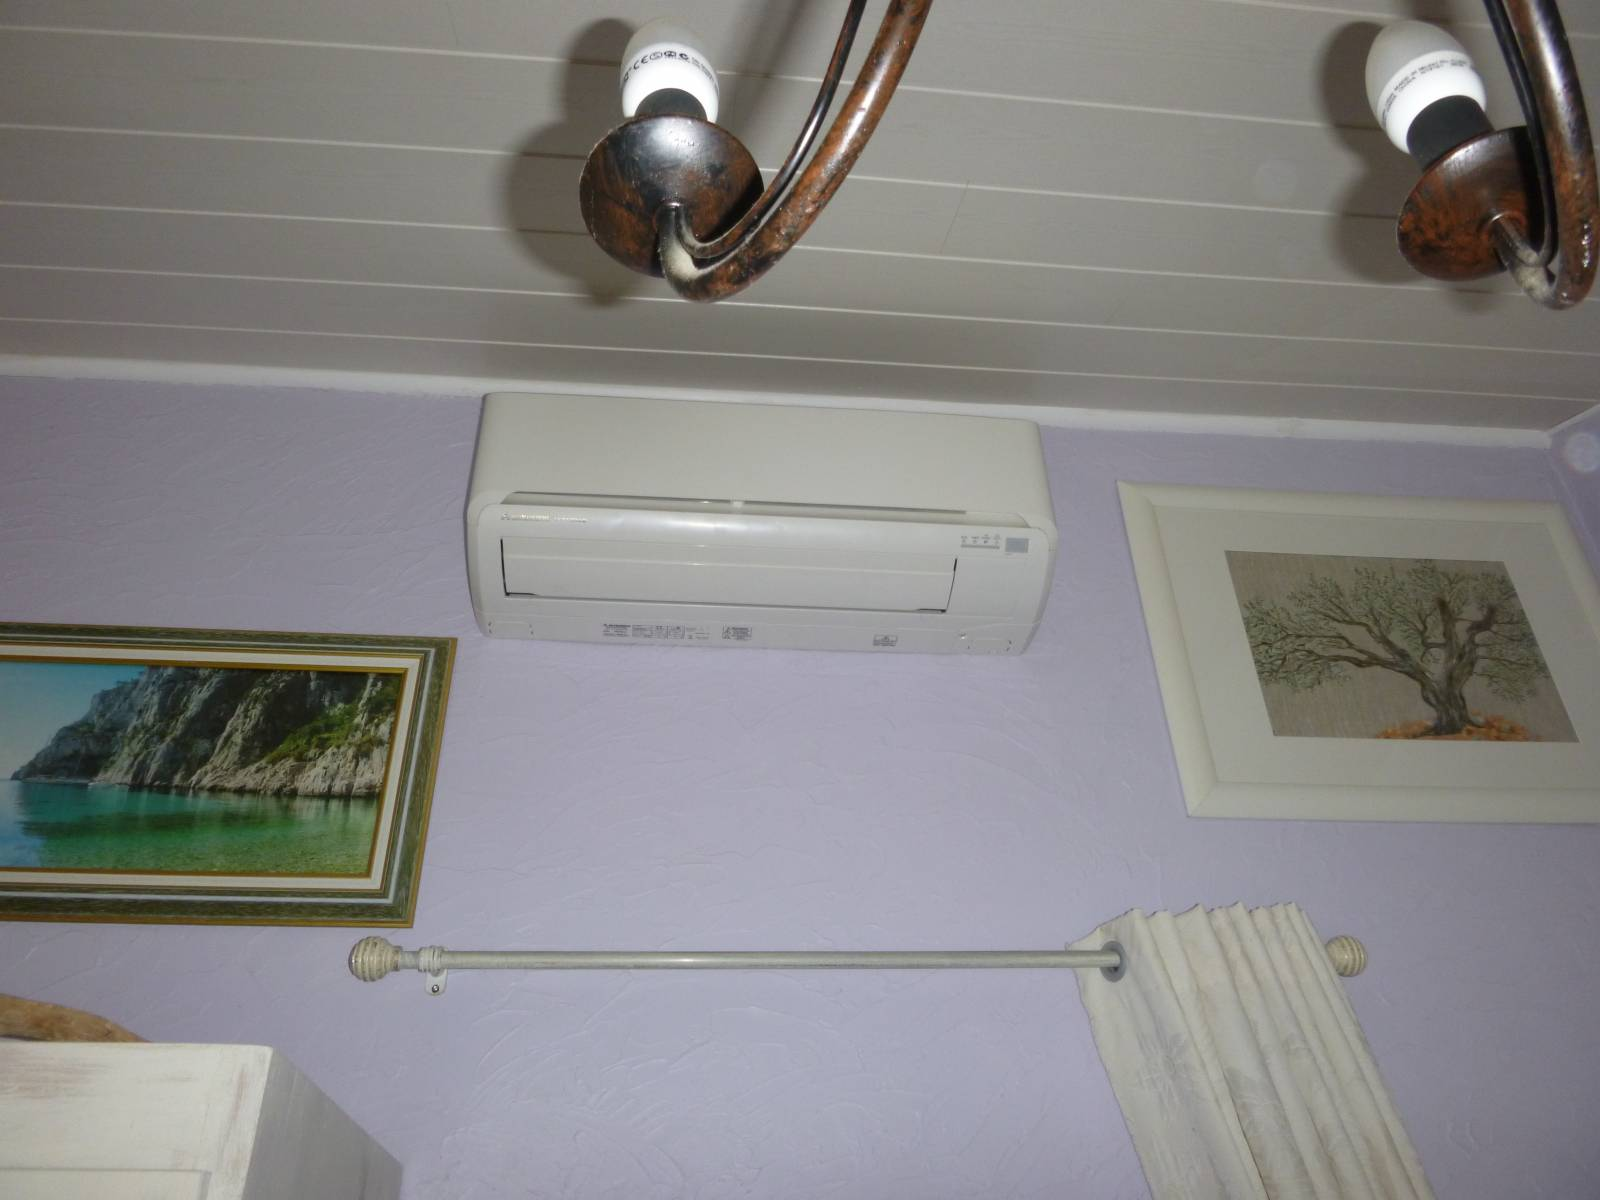 installation de climatisation r versible mitsubishi aubagne axiome 13. Black Bedroom Furniture Sets. Home Design Ideas